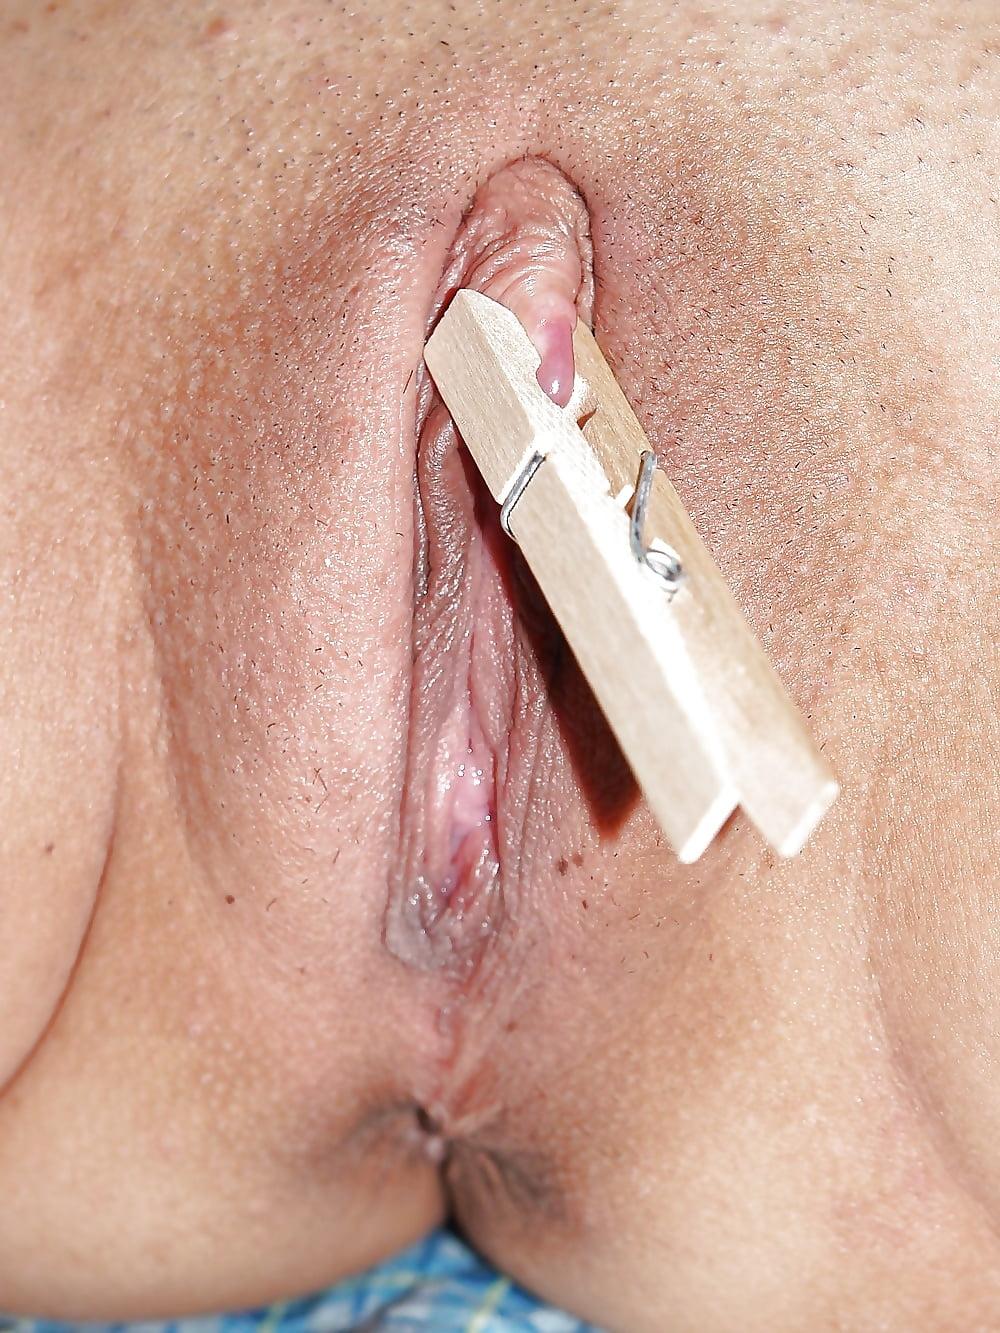 What happens when a vagina gets wet